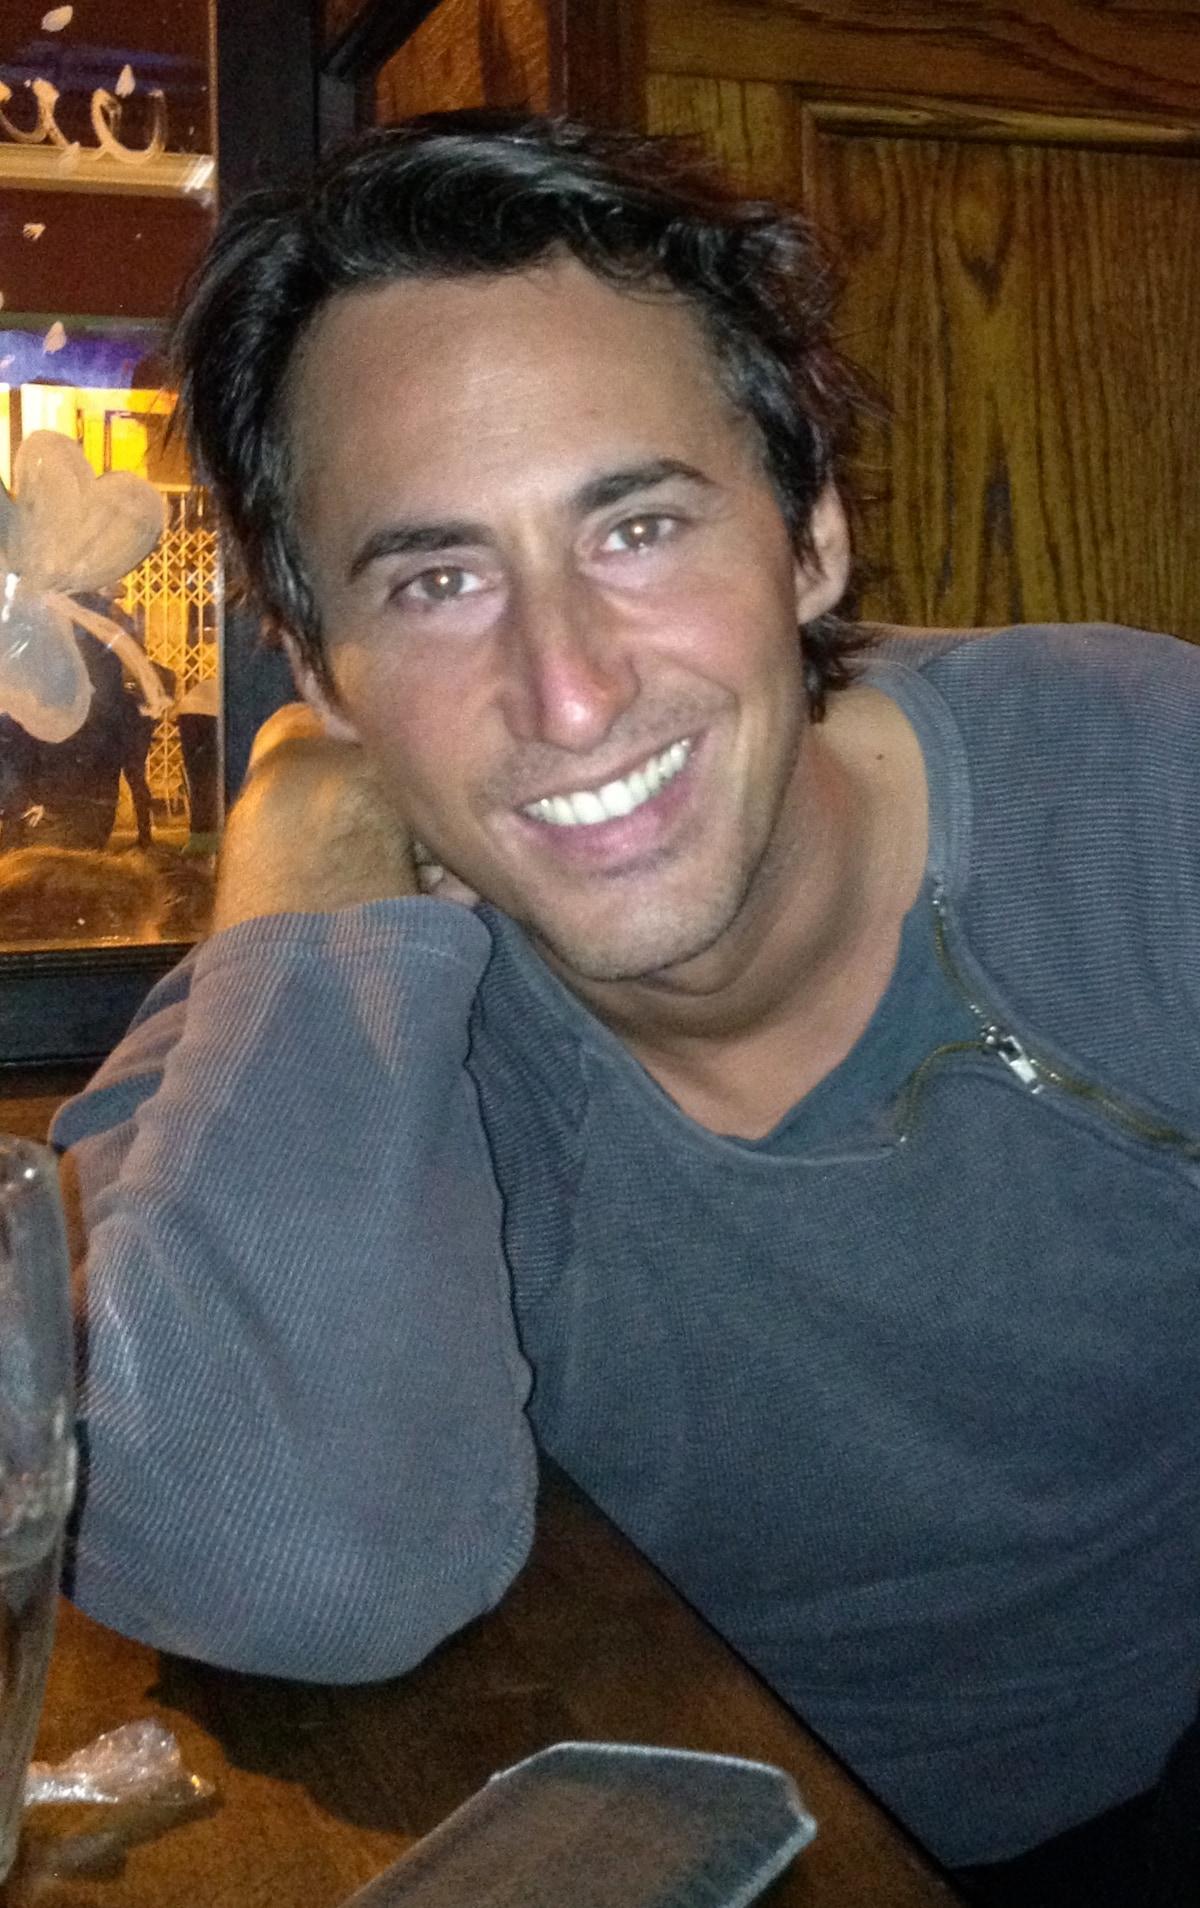 Fabio from Bibbona